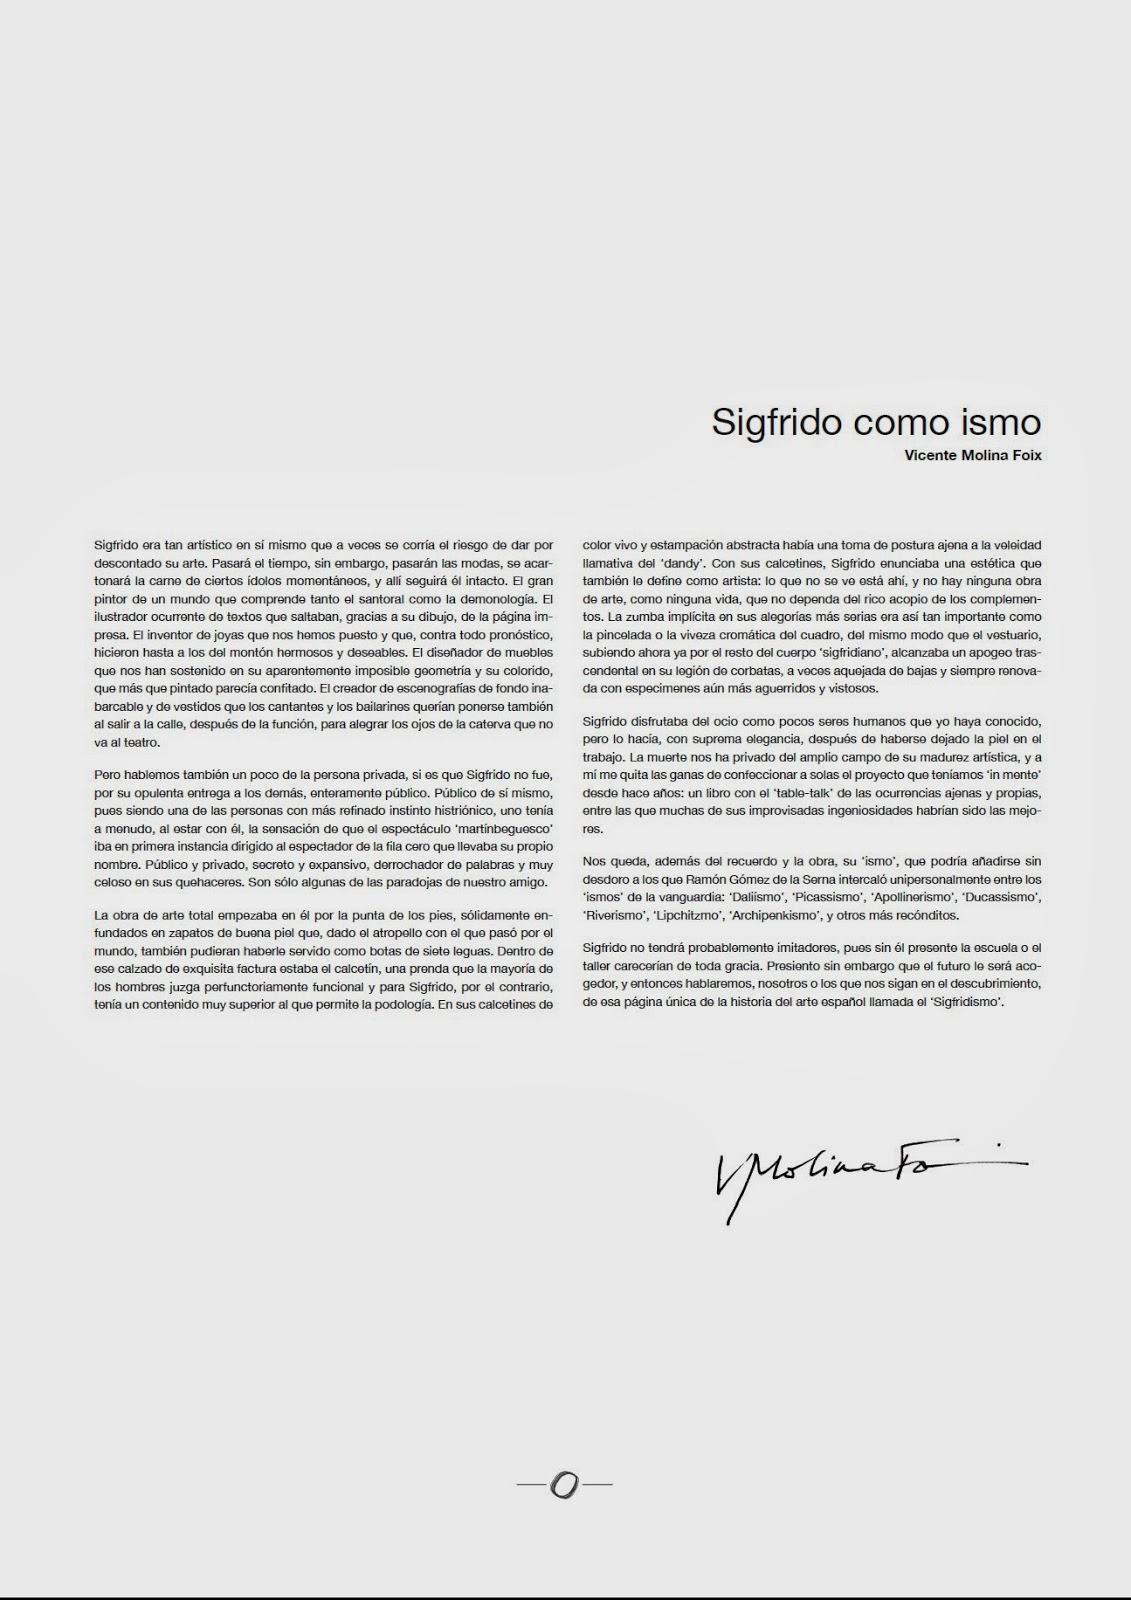 Sigfrido como ismo texto de Vicente Molina Foix Sigfridismos Homenaje a Sigfrido Martín Begué